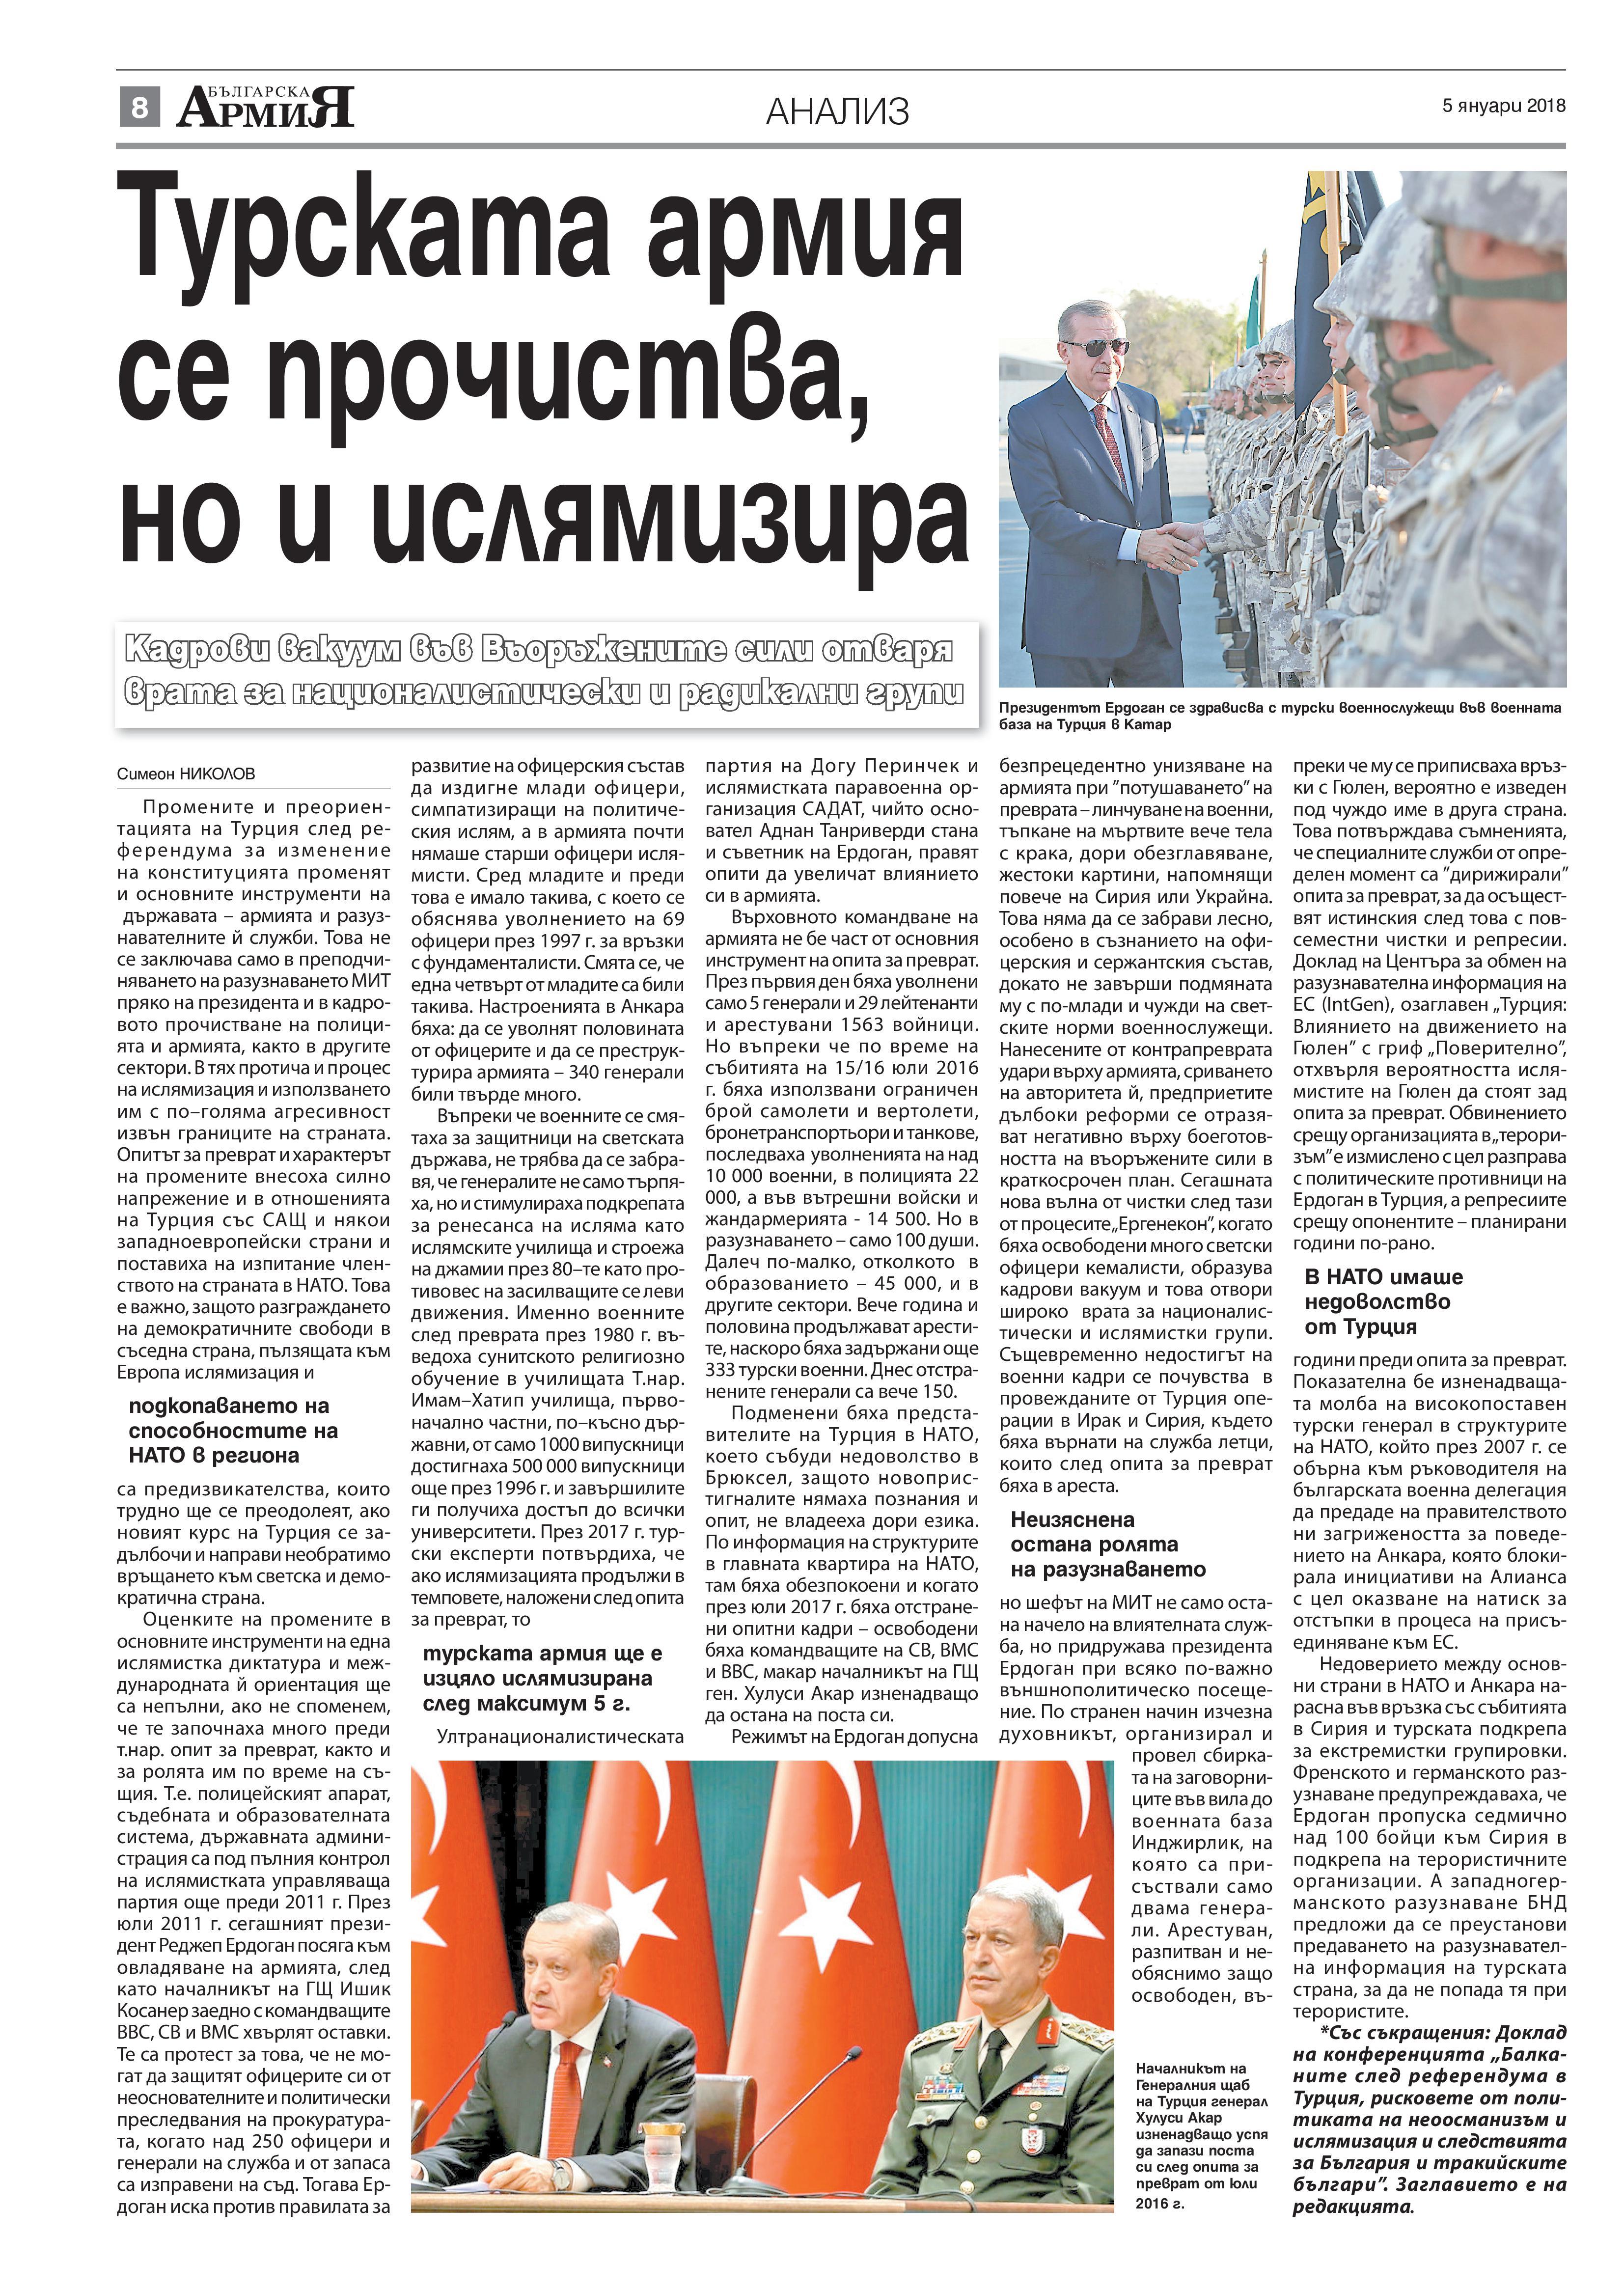 http://armymedia.bg/wp-content/uploads/2018/01/08.jpg